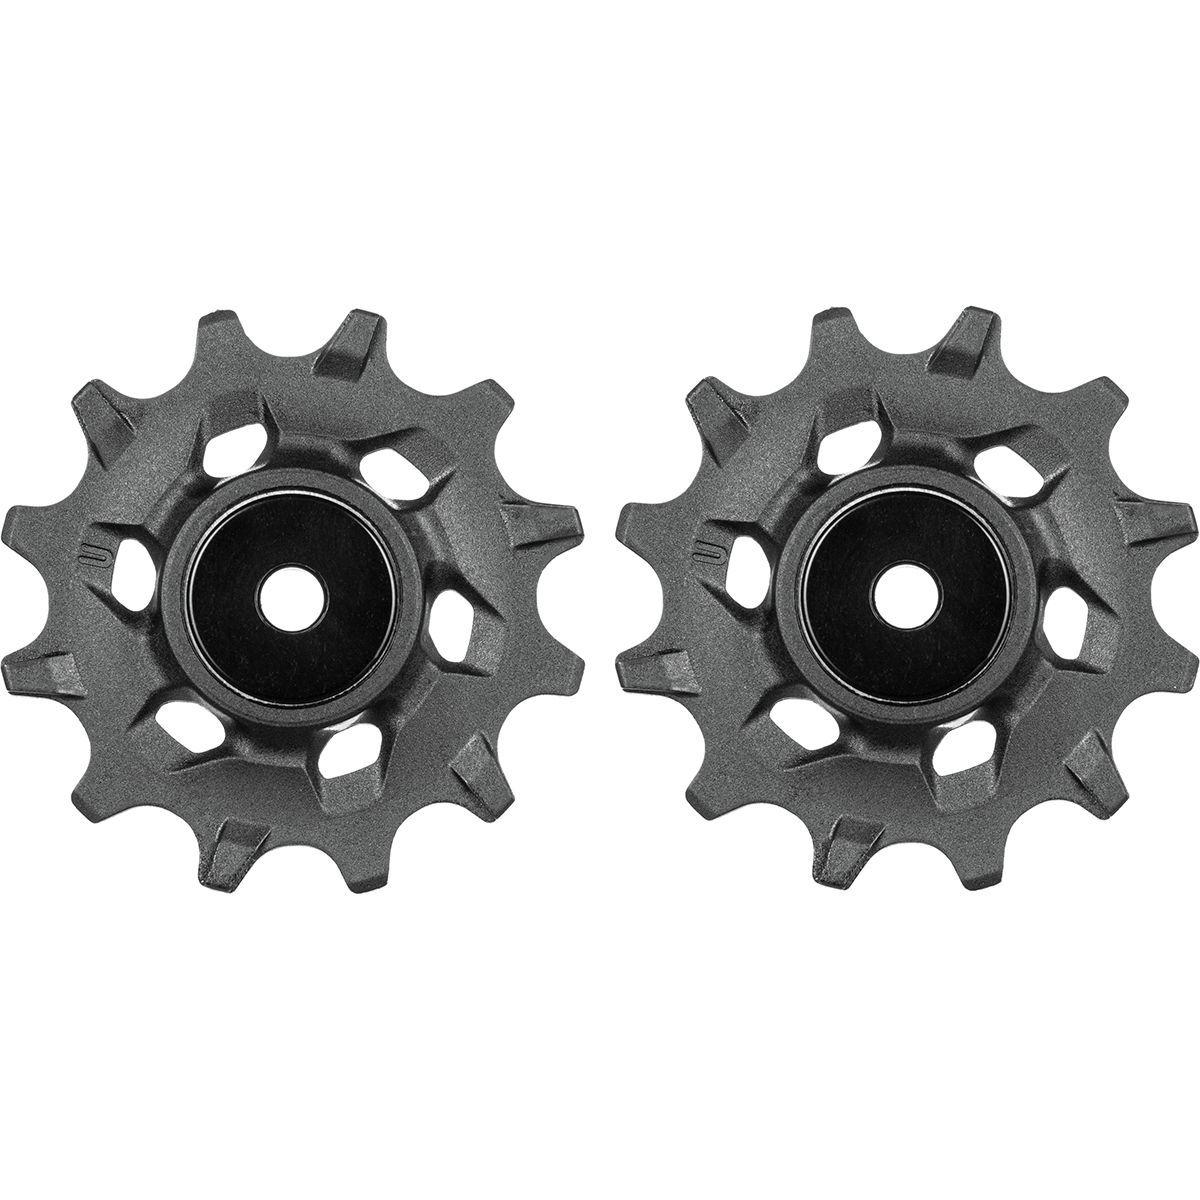 Sram X Sync Ceramic Pulley Wheel Assembly Kit Pulley Ceramics Sync